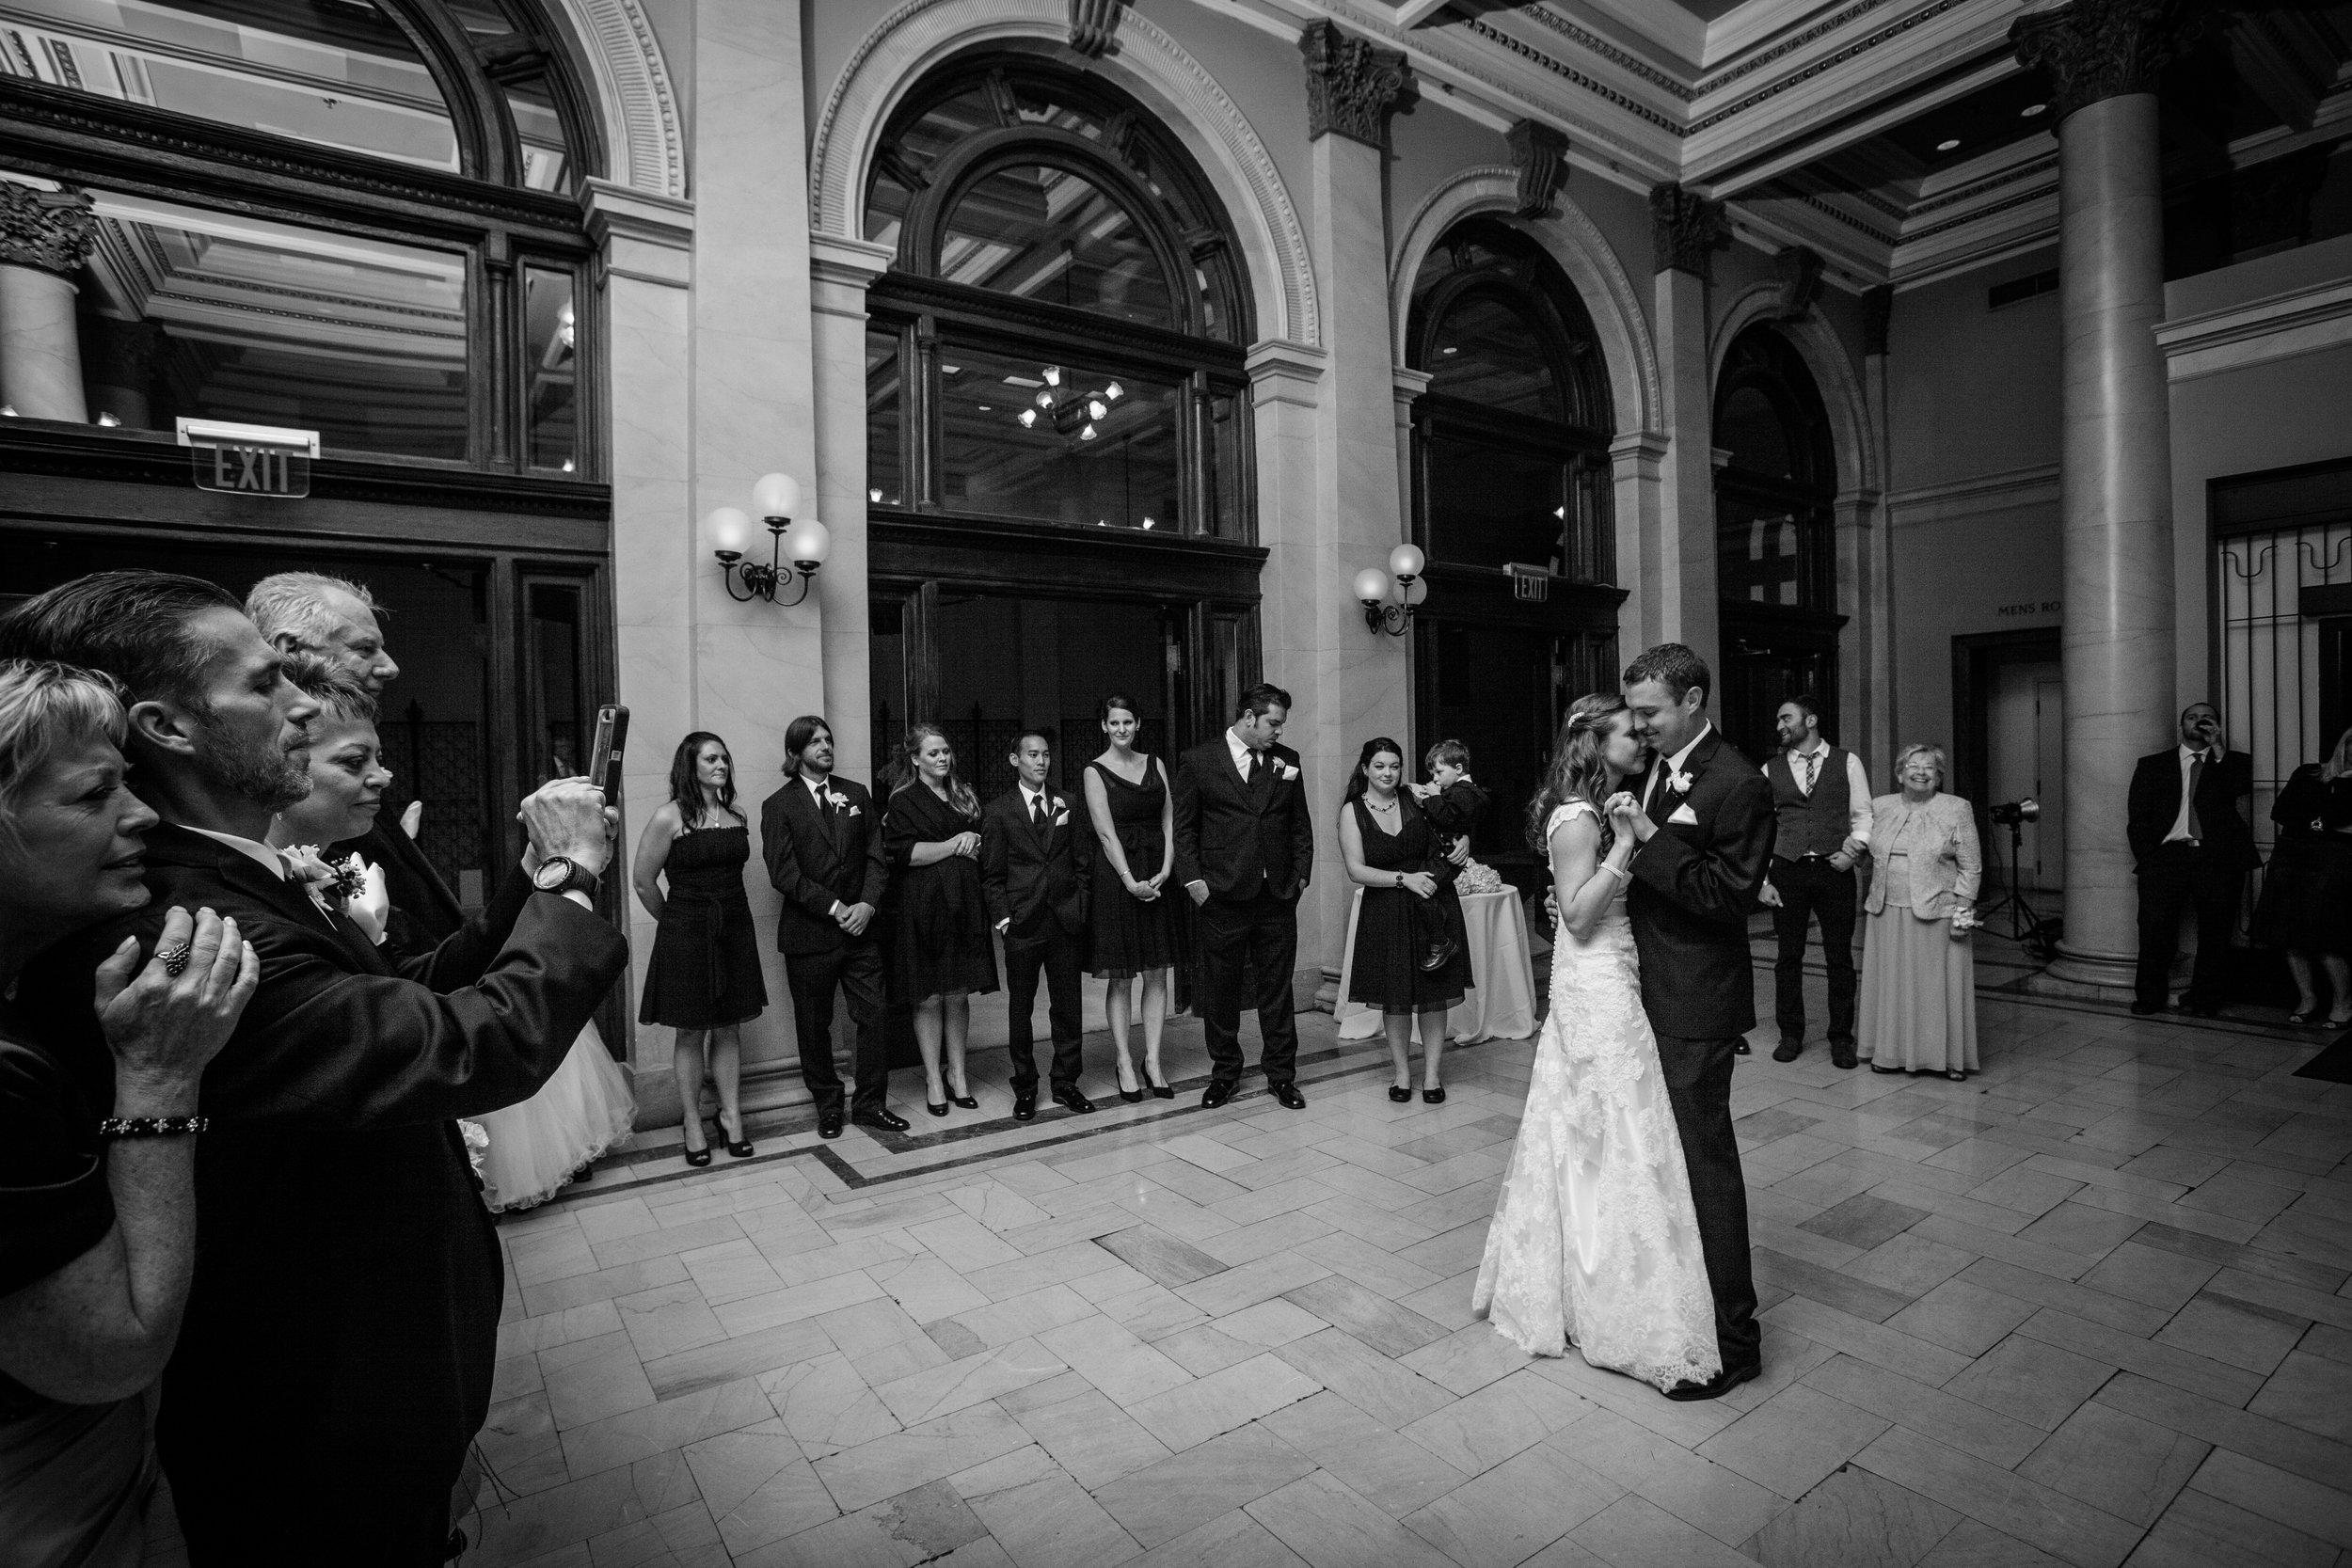 VMFA-Marble-Hall-Wedding.jpg